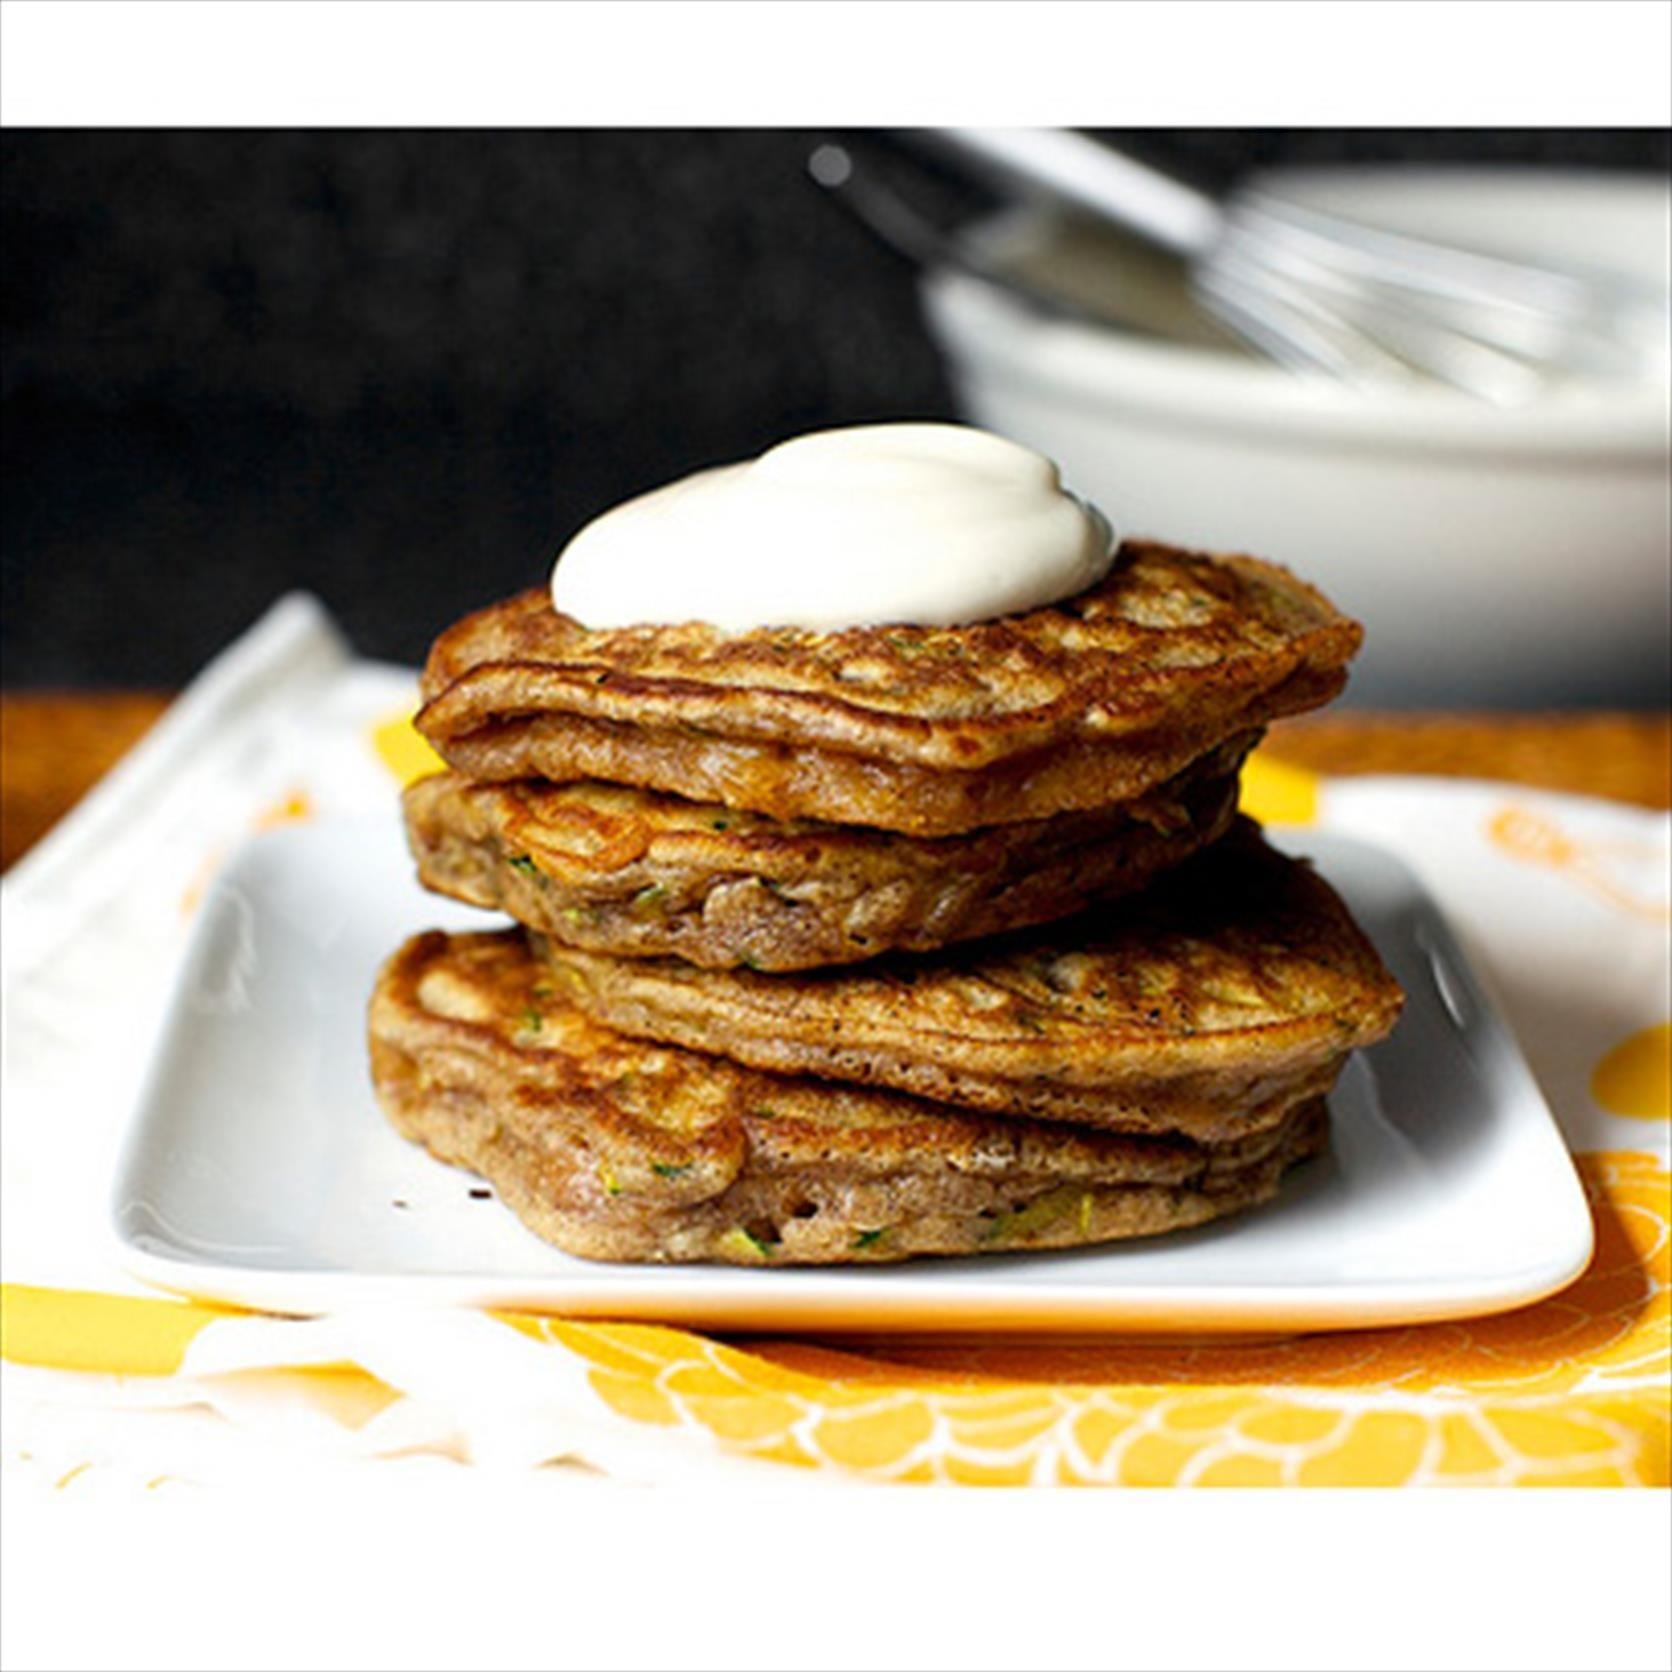 Zucchini Bread Pancakes - Smitten Kitchen #pancakeday